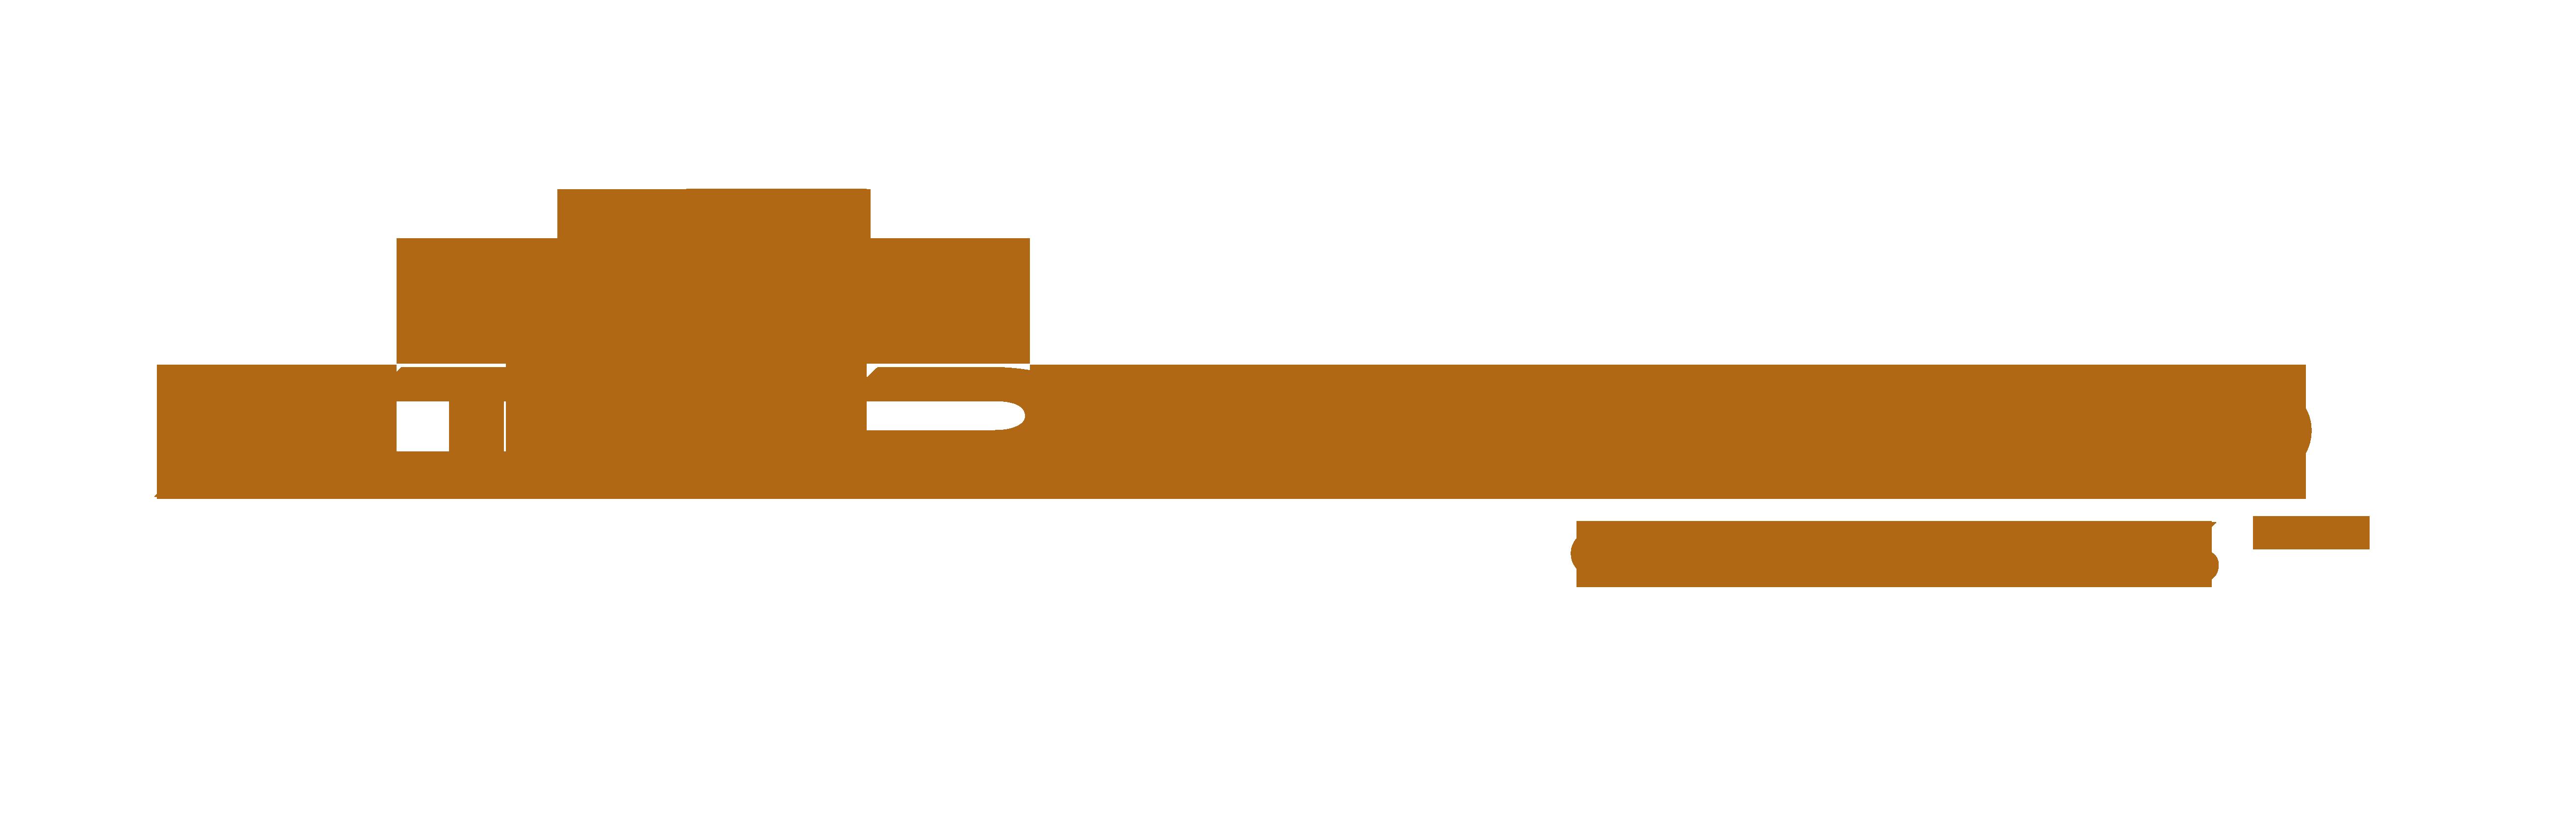 StarboardGamesLLC_Logo.png